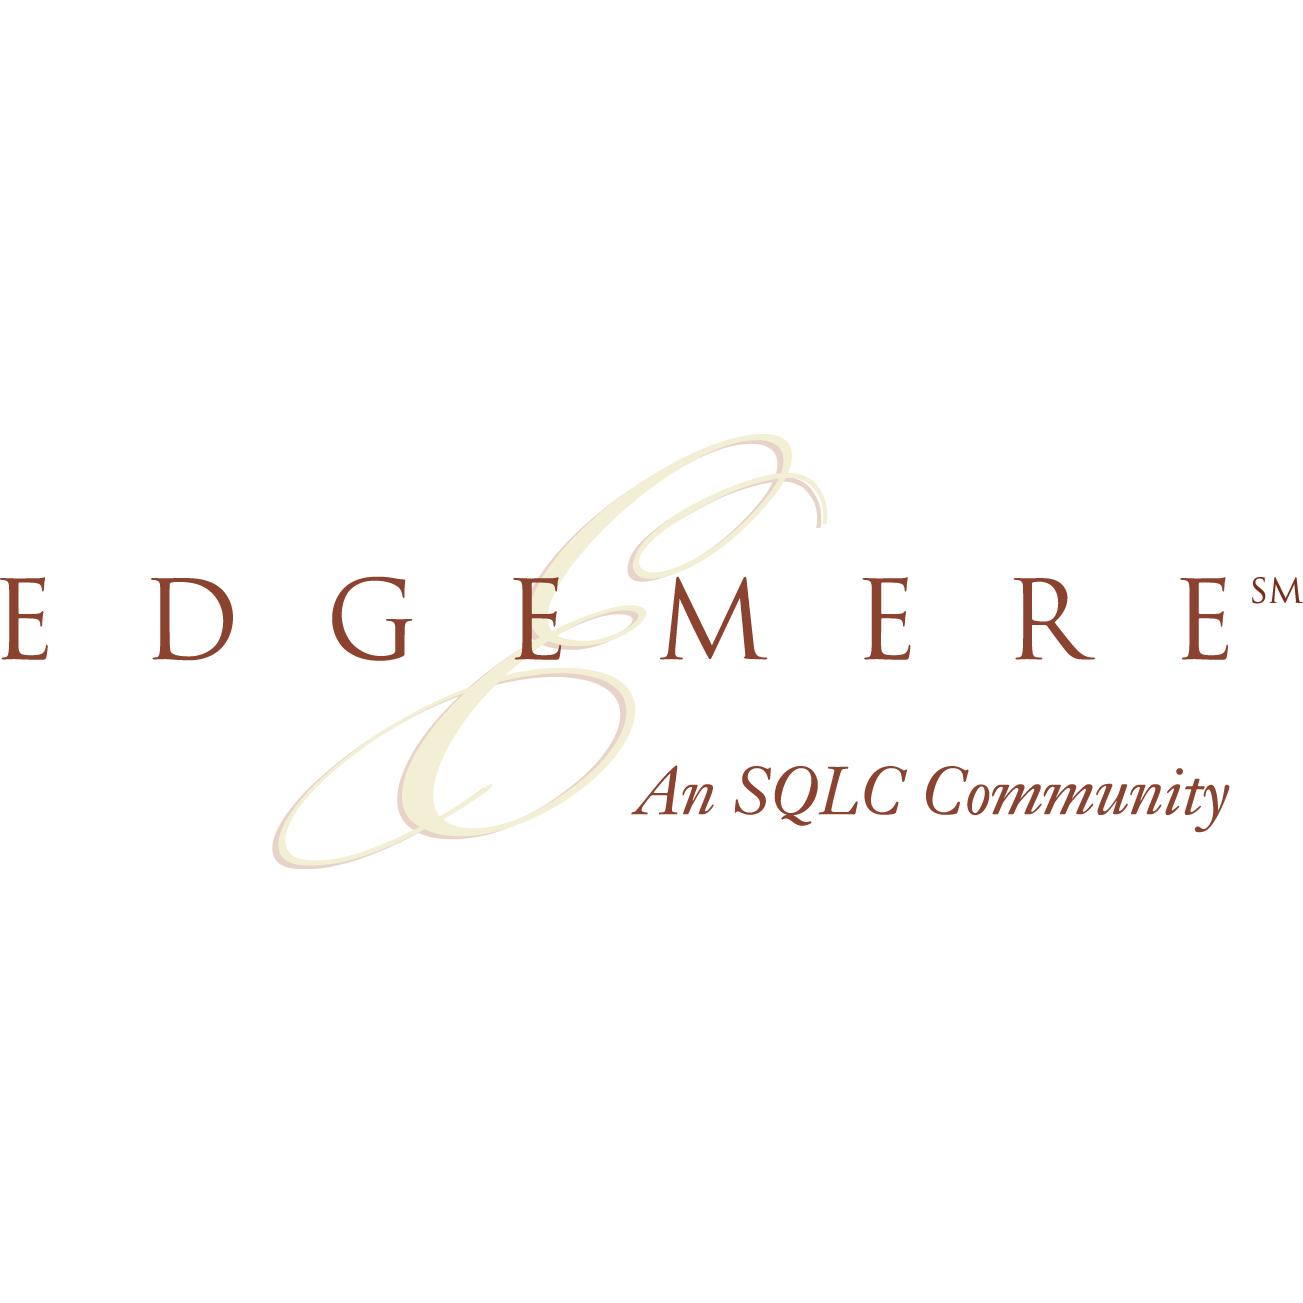 Edgemere